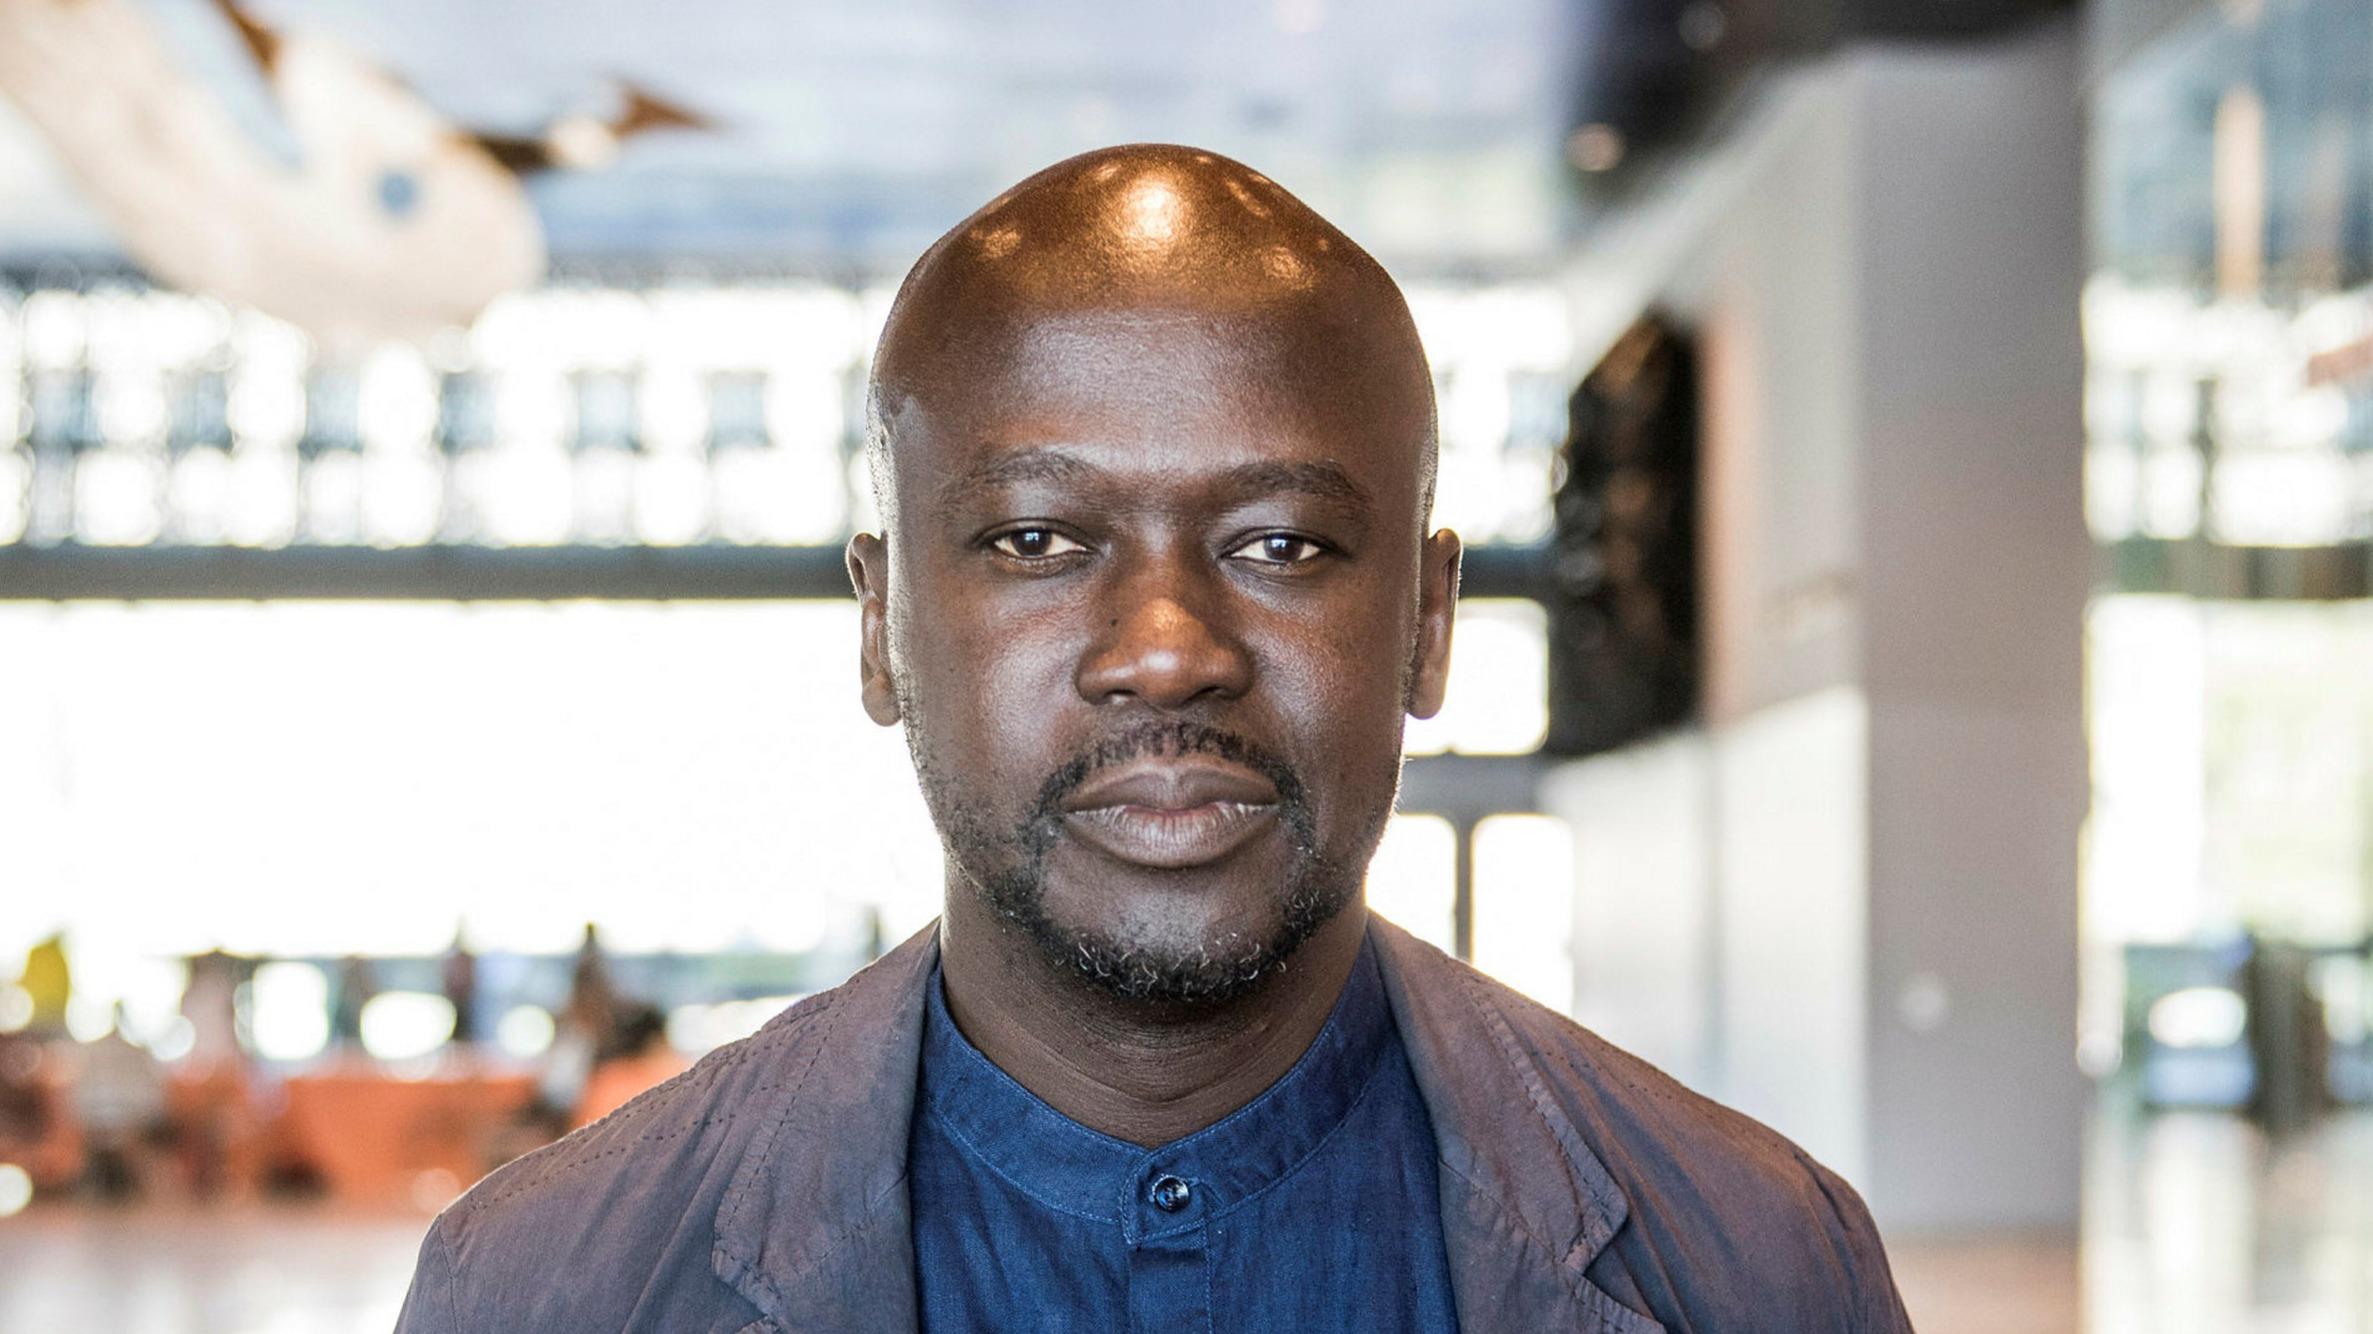 ft.com - Edwin Heathcote - David Adjaye wins Riba Royal Gold Medal for architecture